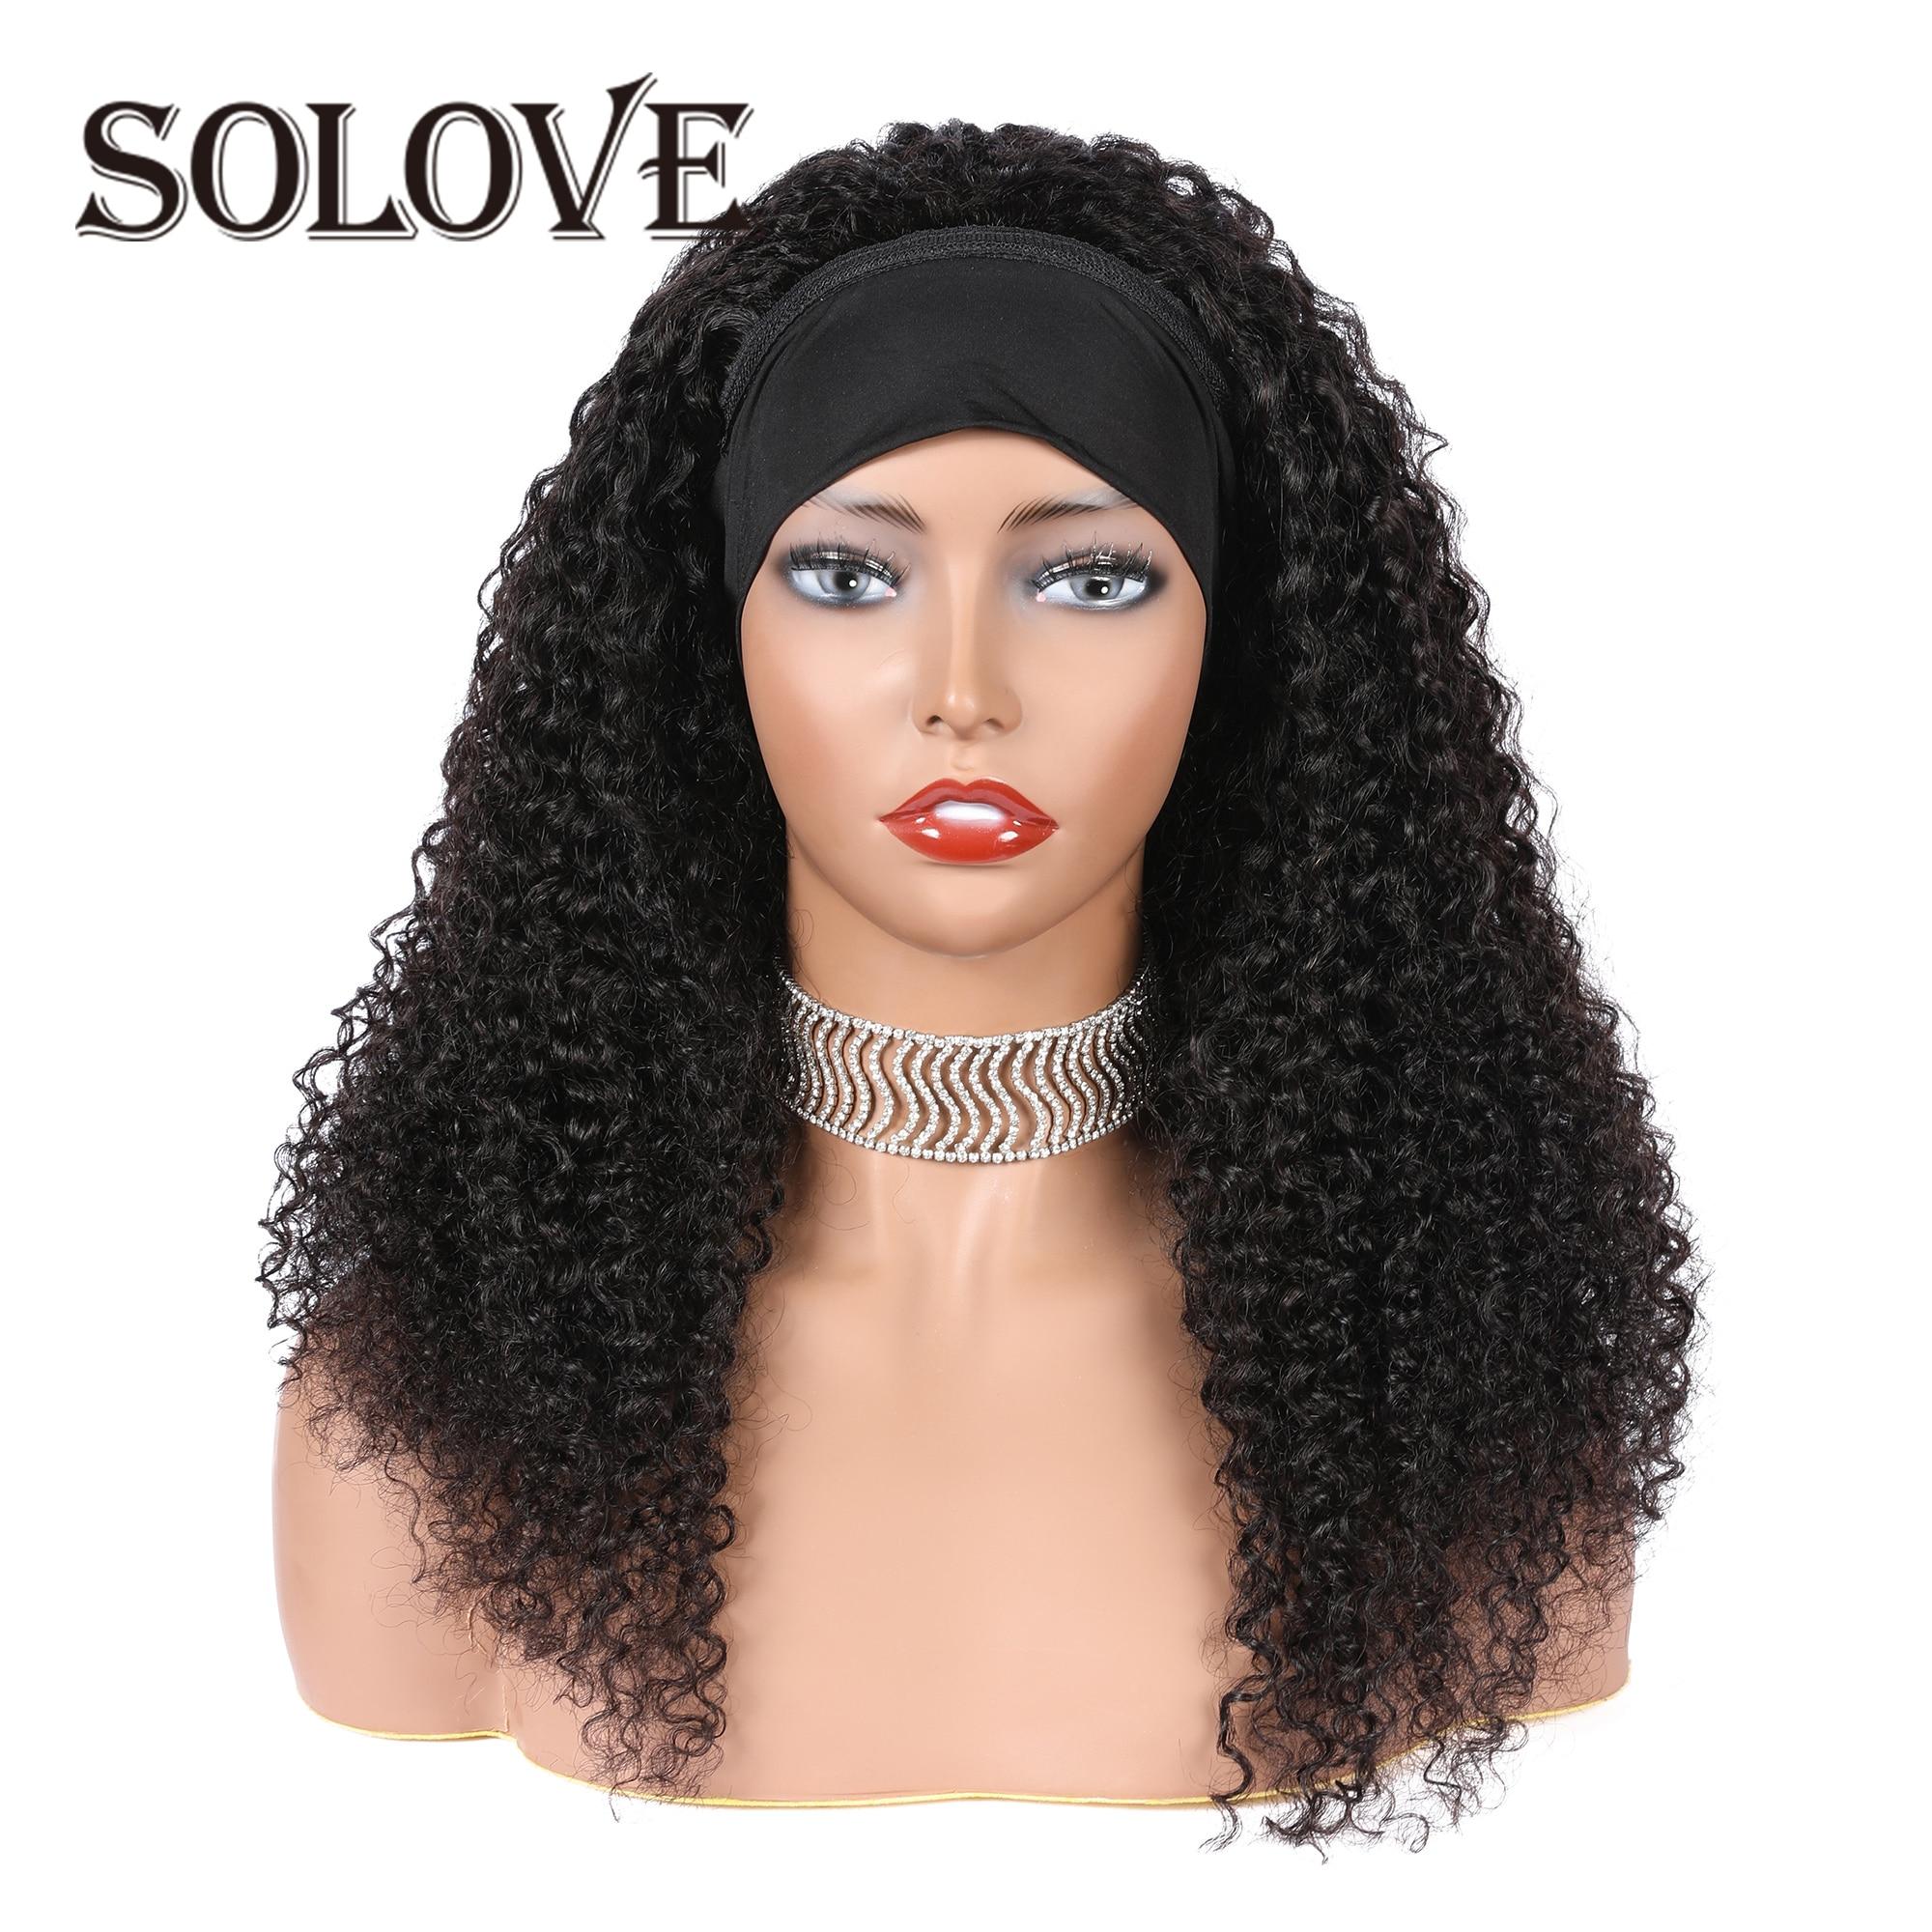 Kinky Curly Headband Scarf Wig Glueless Human Hair Wigs for Black Women Headband Wig With Brazilian Virgin Hair